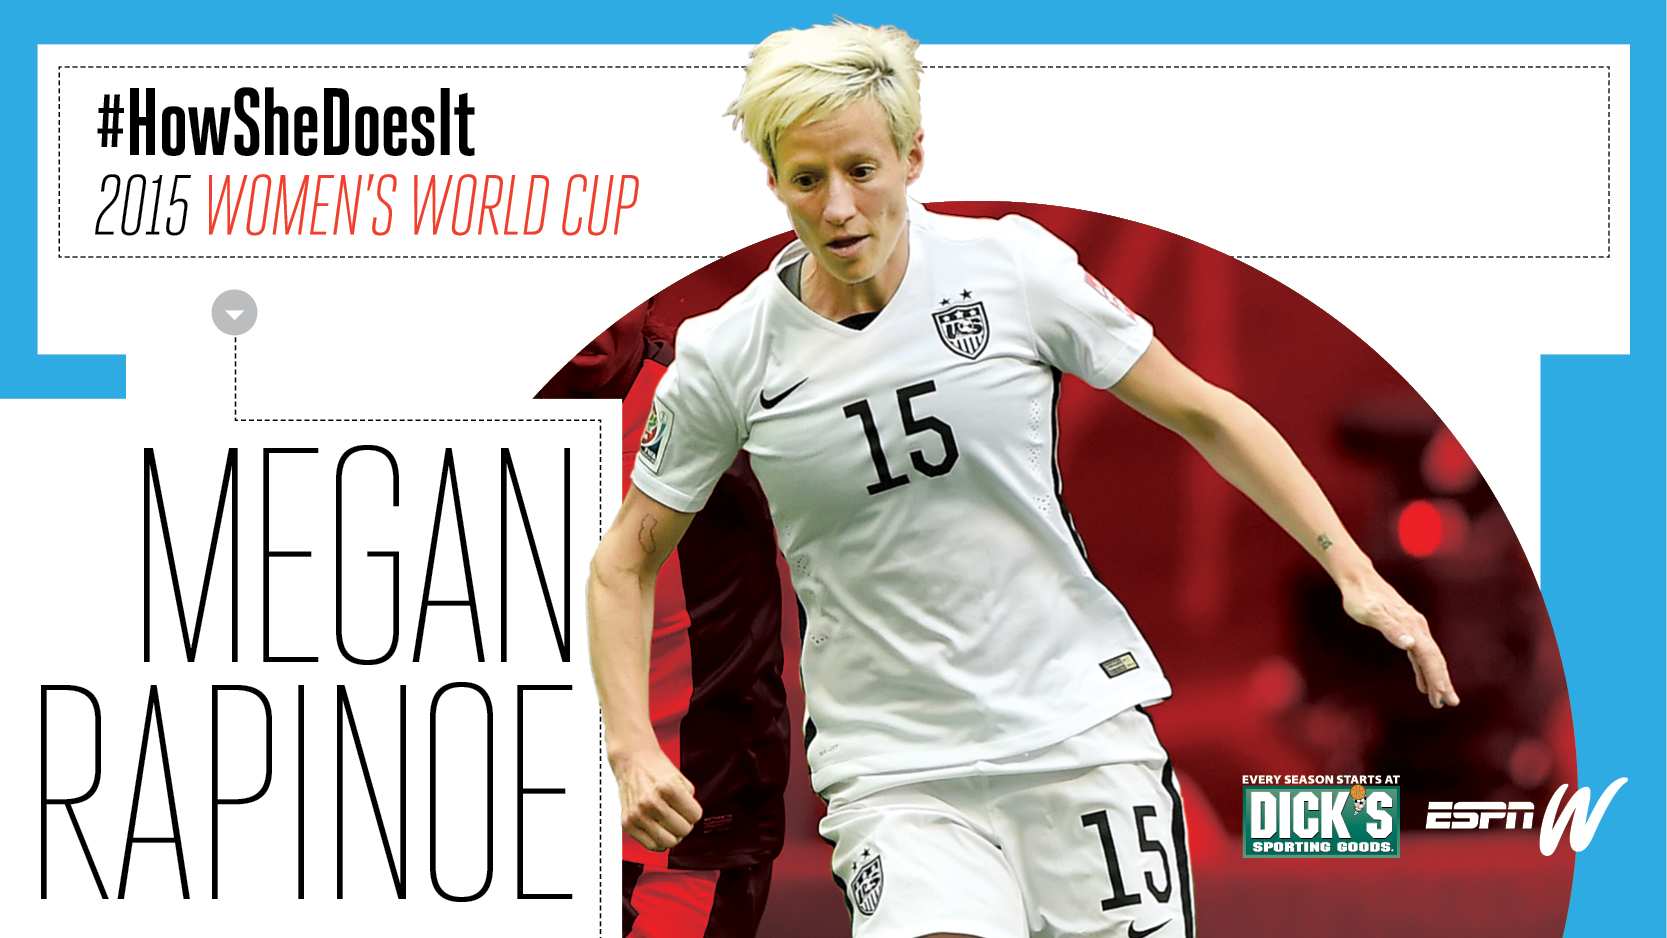 espnW #HowSheDoesIt Womens World Cup - Megan Rapinoe